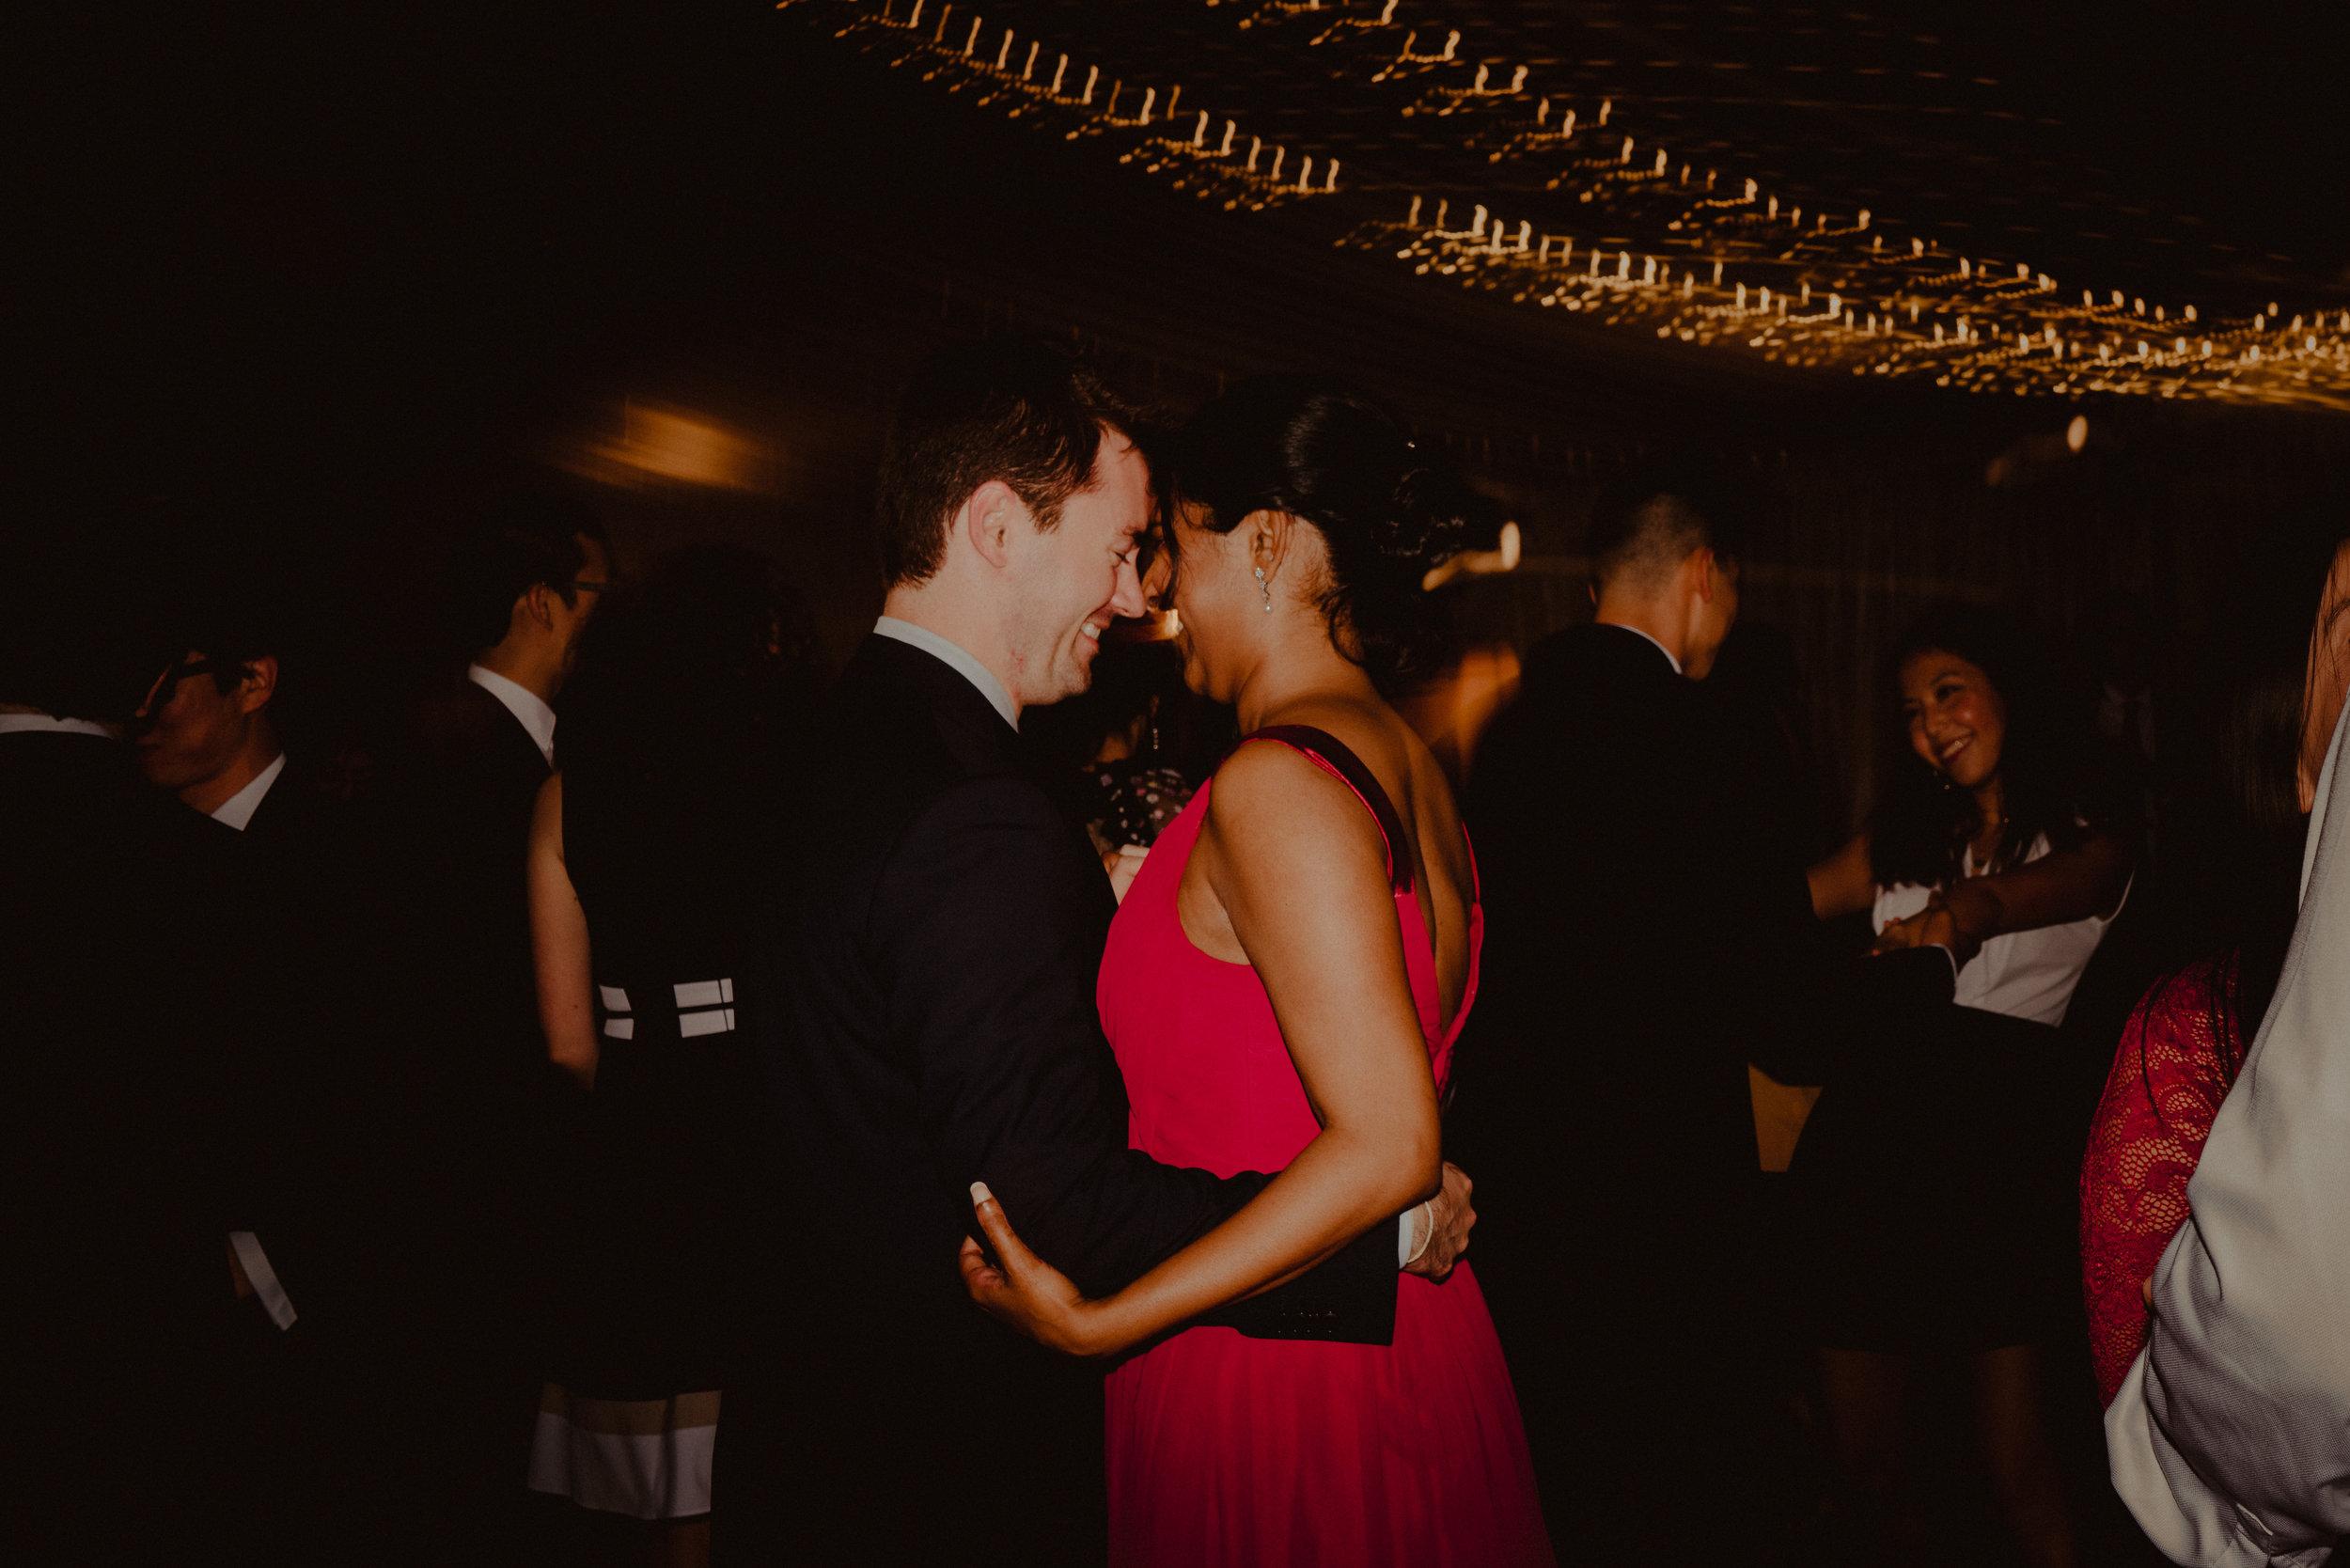 Irene-and-Jae-2019_Brooklyn_Wedding_Photographer_Chellise_Michael_Photography--161.jpg